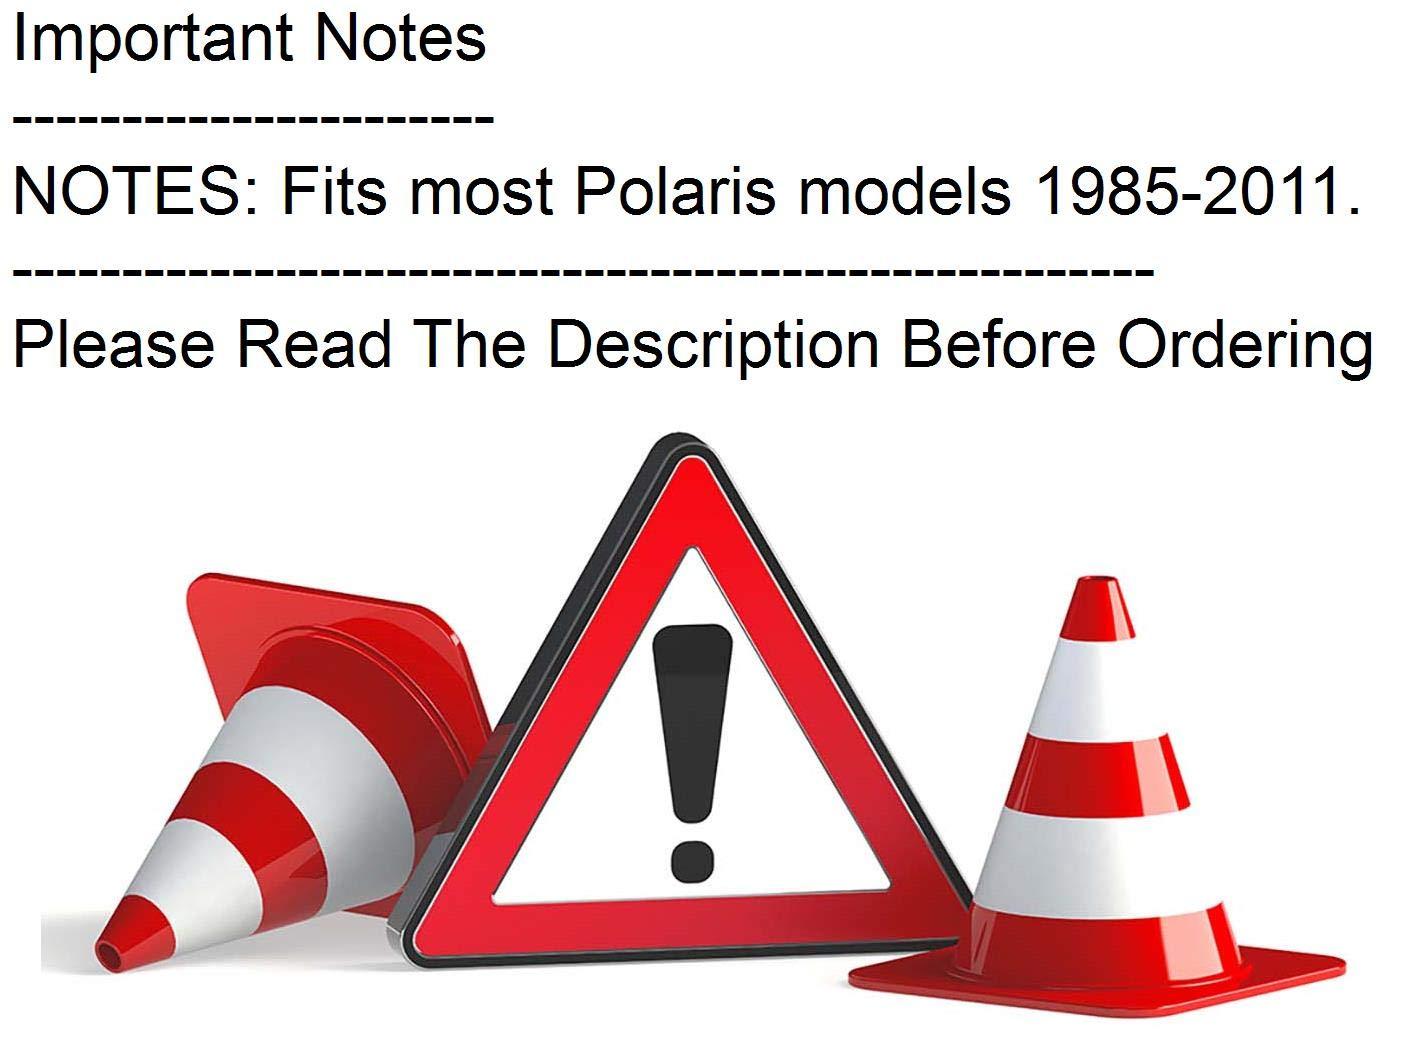 Taillight Lens For 2007 Polaris Sportsman 800 EFI ATV~Emgo 62-21563